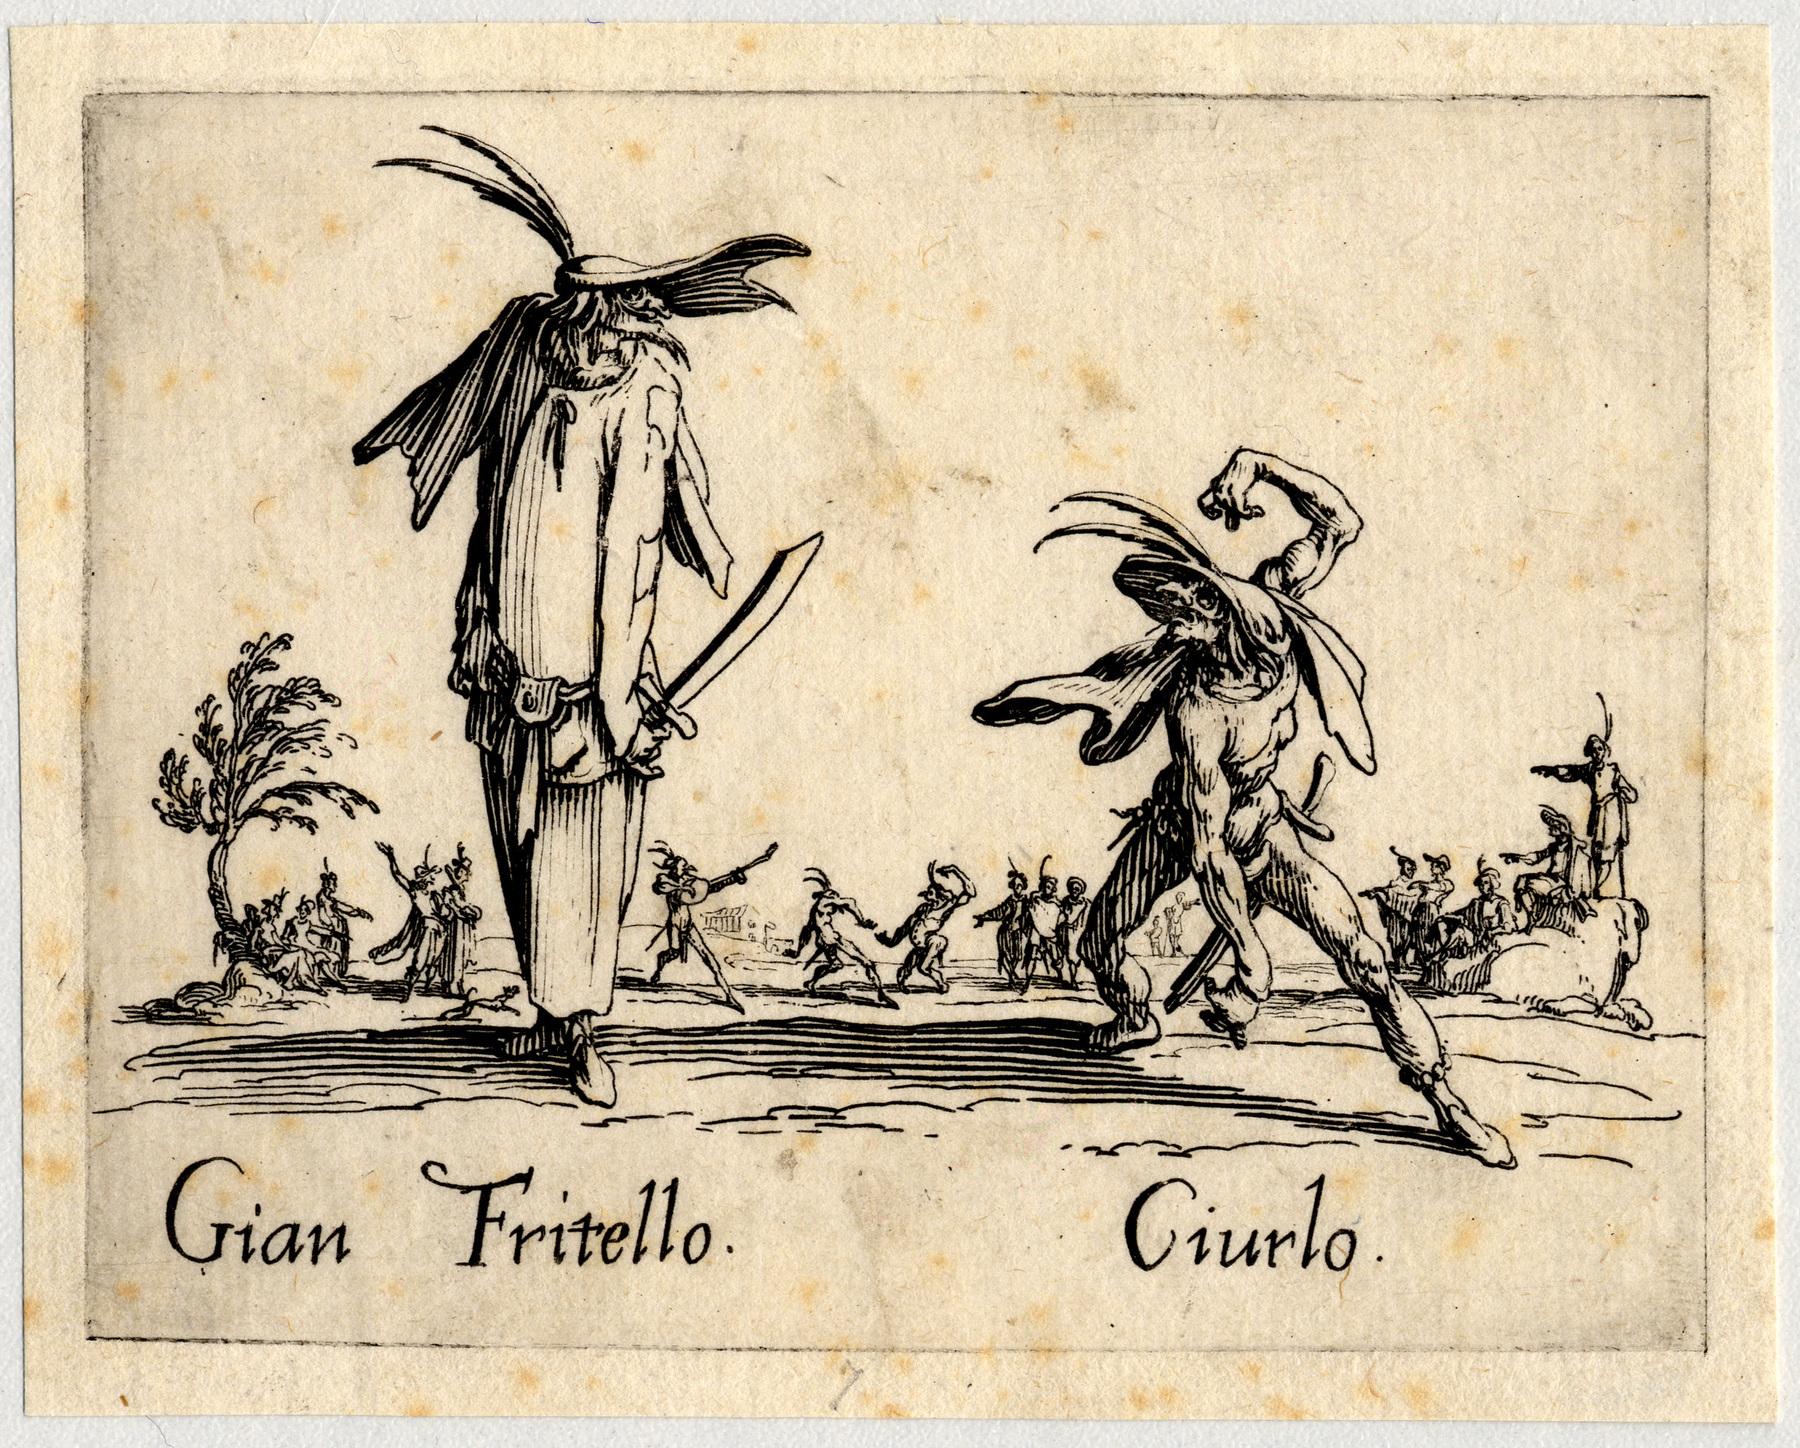 Contenu du Balli di Sfessania : Gian Fritello, Ciurlo